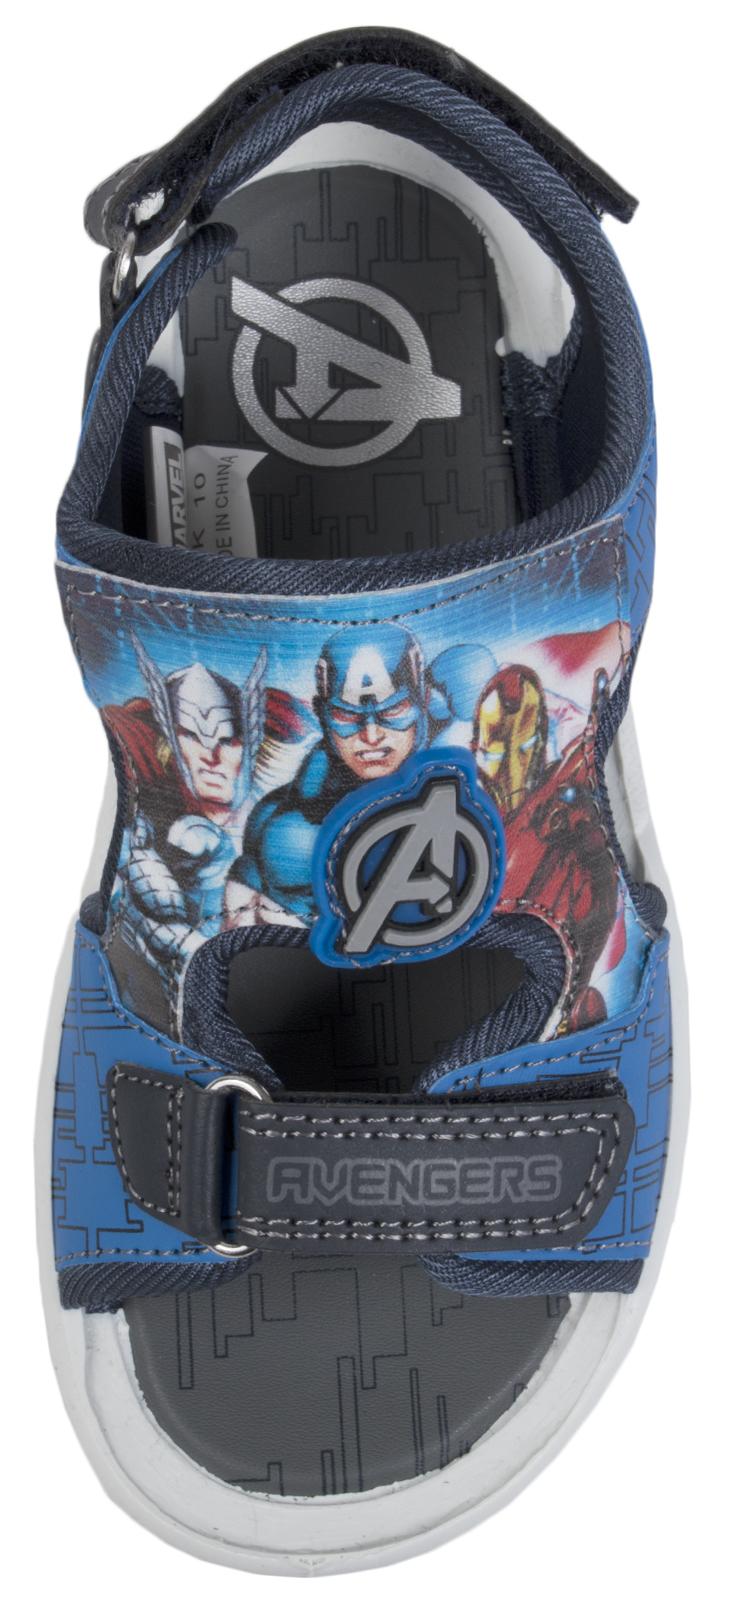 Avengers Sports Sandales réglable Vacances Plage Chaussures Iron Man Hulk Garçons Taille